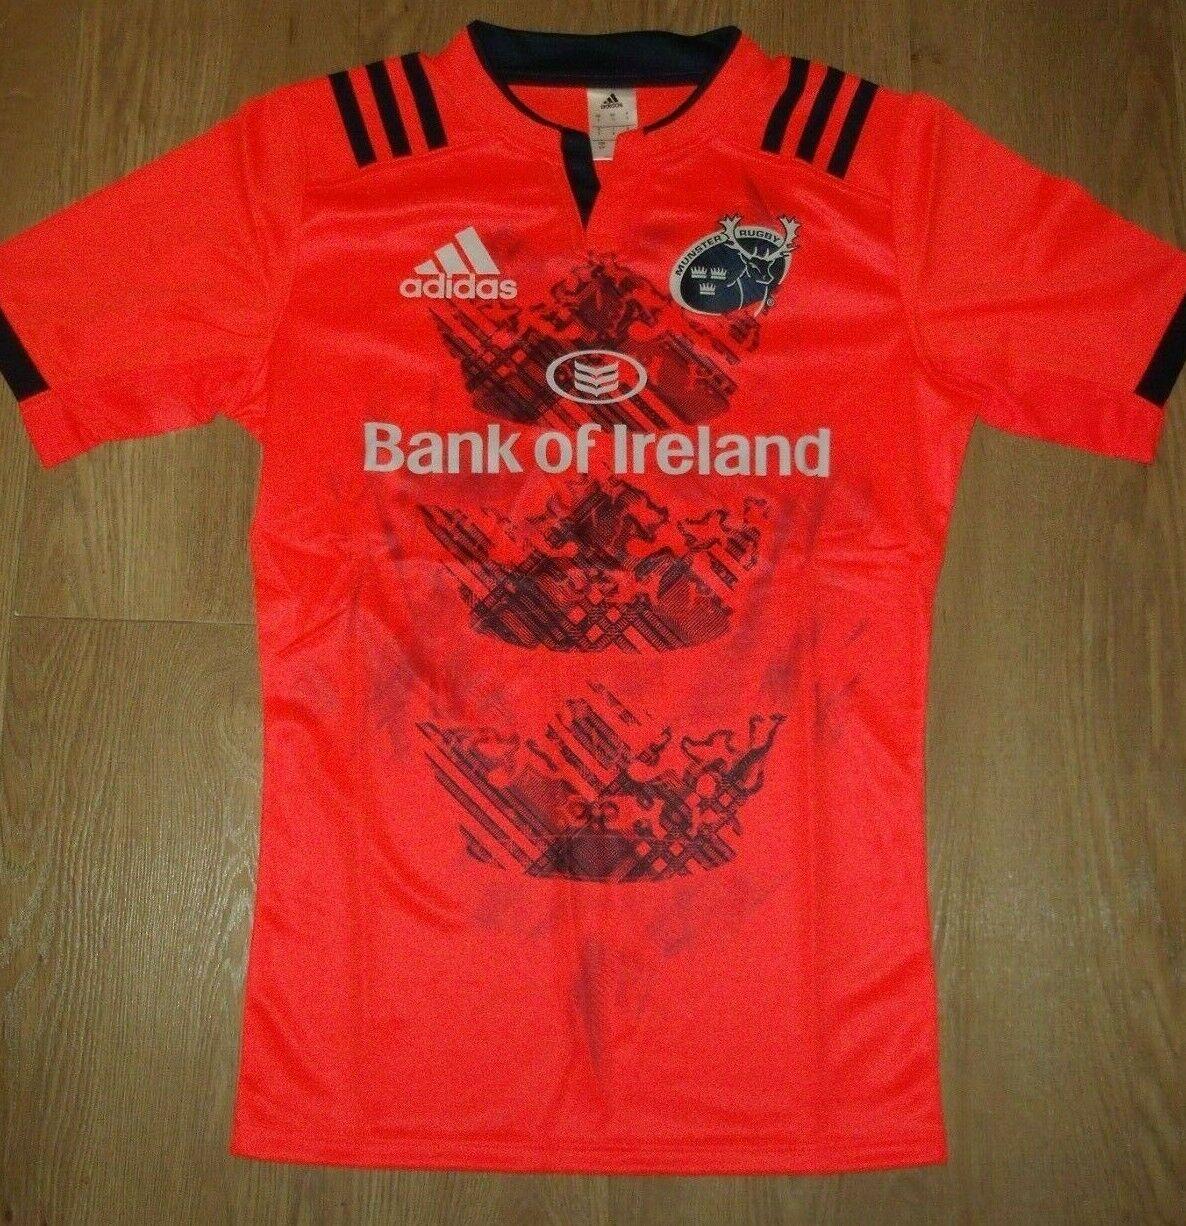 Munster Rugby Irland Irisch Hemd Trikot Trikot Trikot Adidas Orange Krone S L XL XXL XXXL Neu 39ce0d